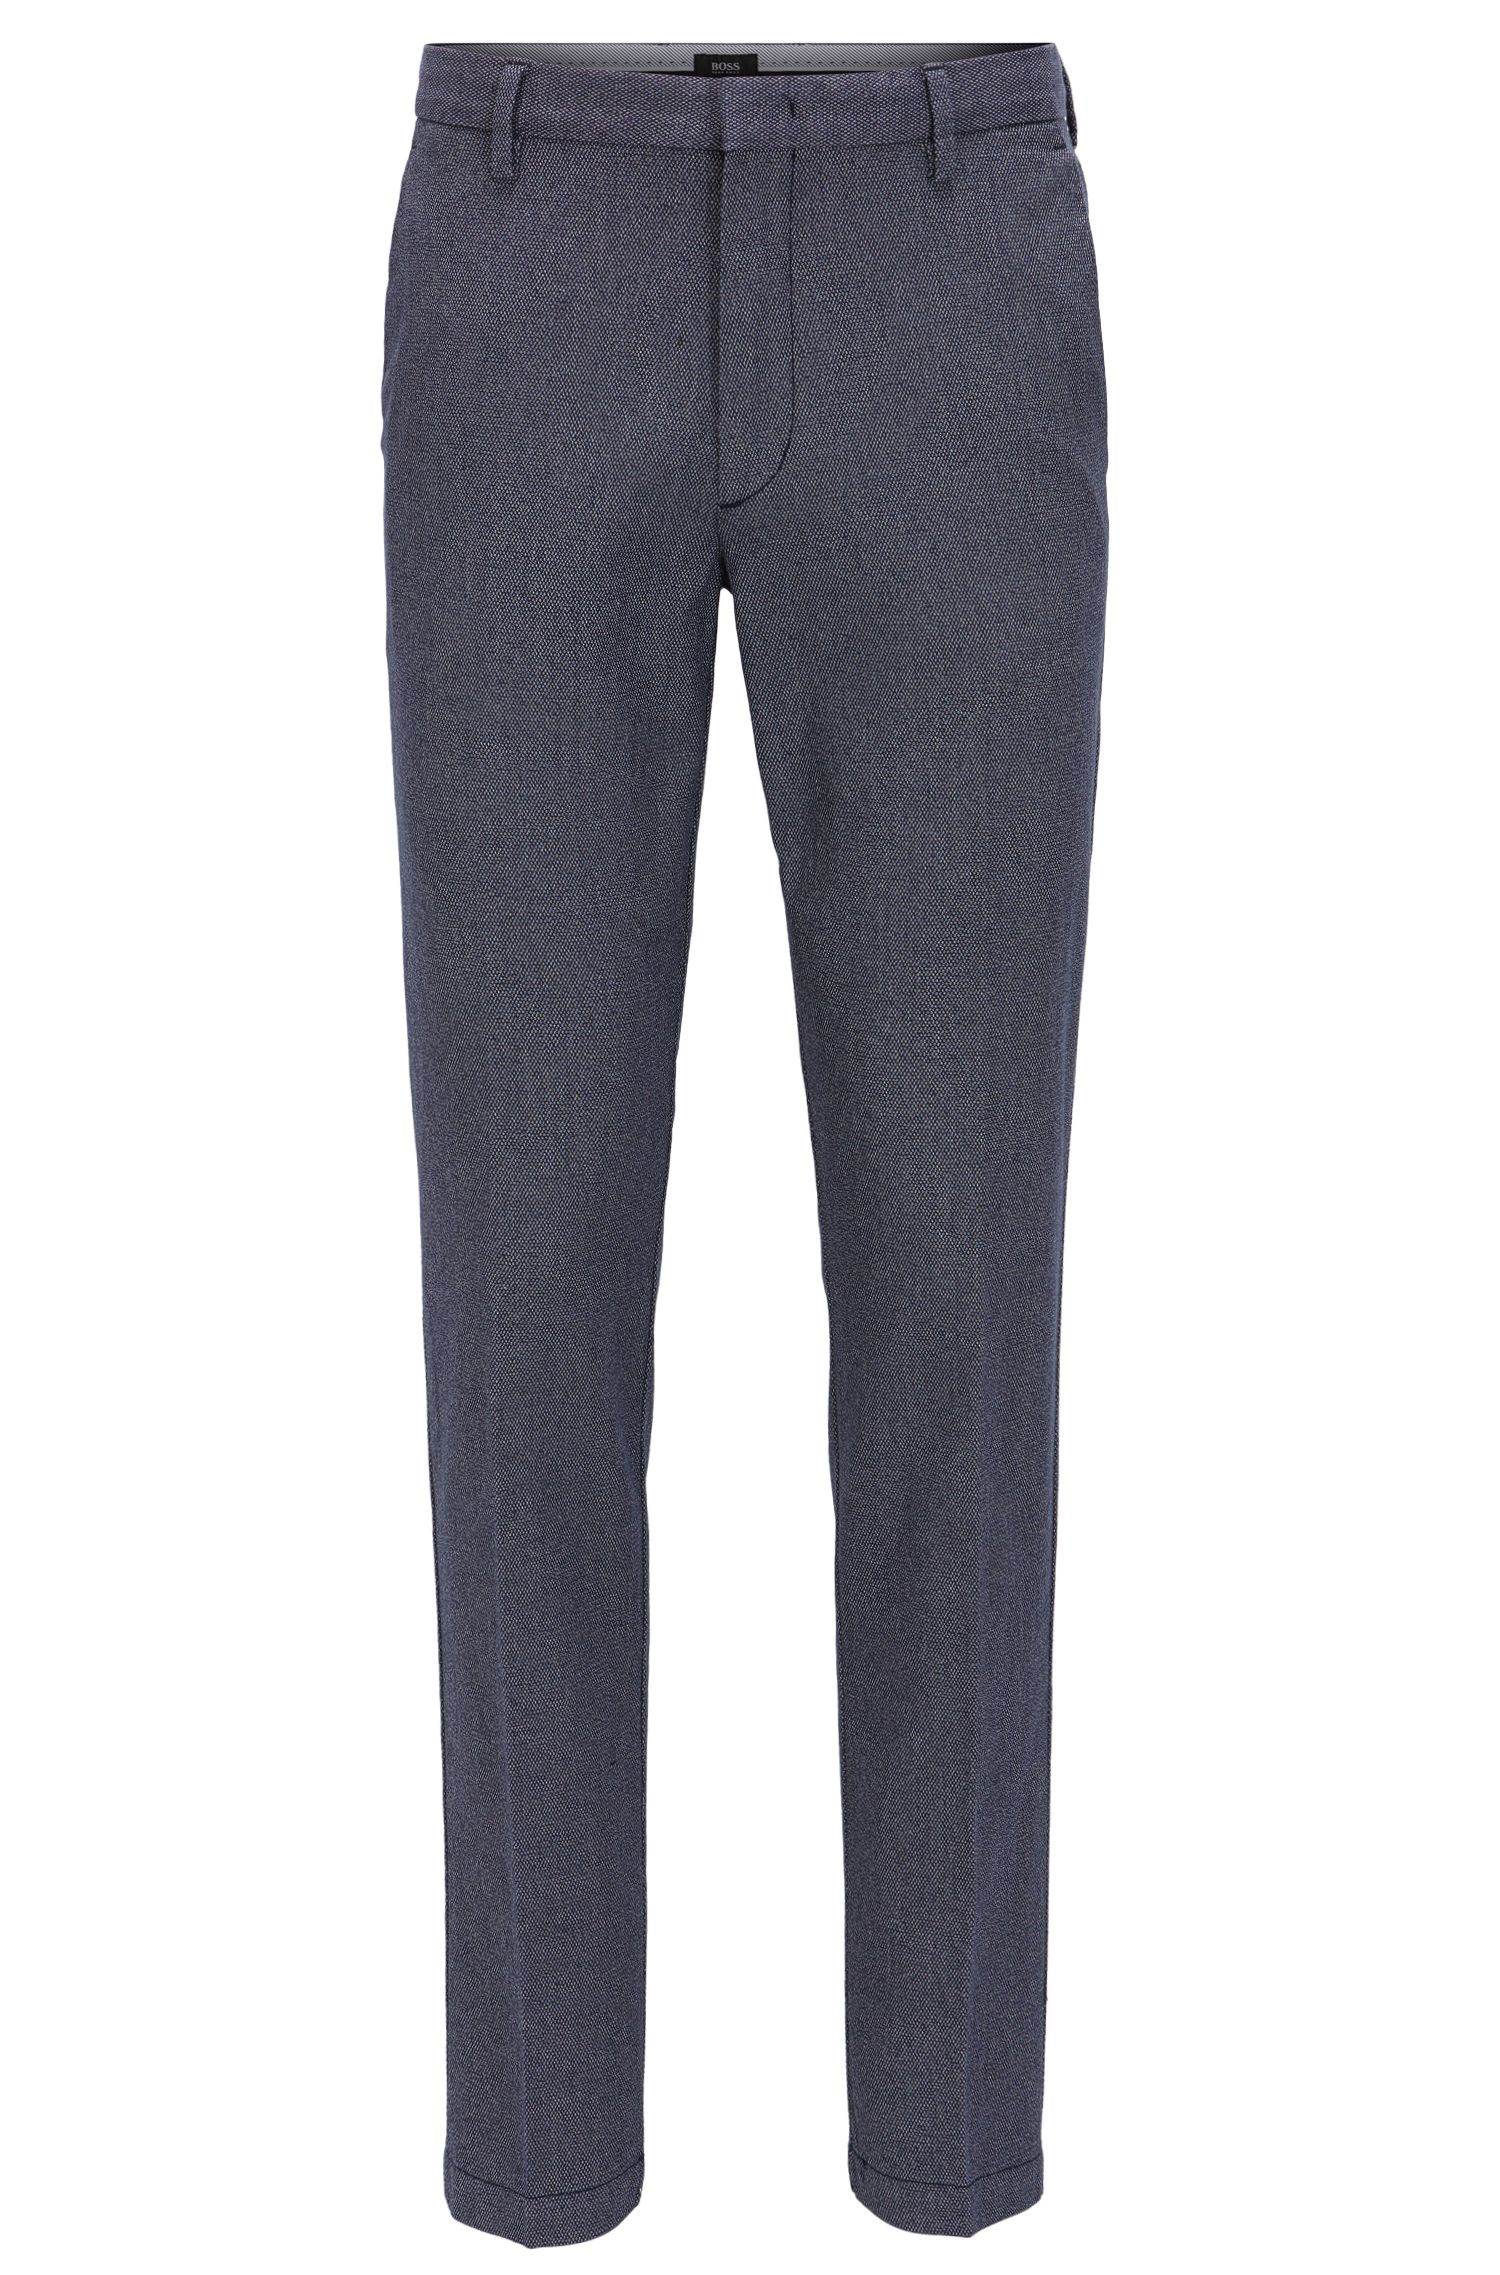 Birdseye Cotton Pant, Slim Fit | Kaito W